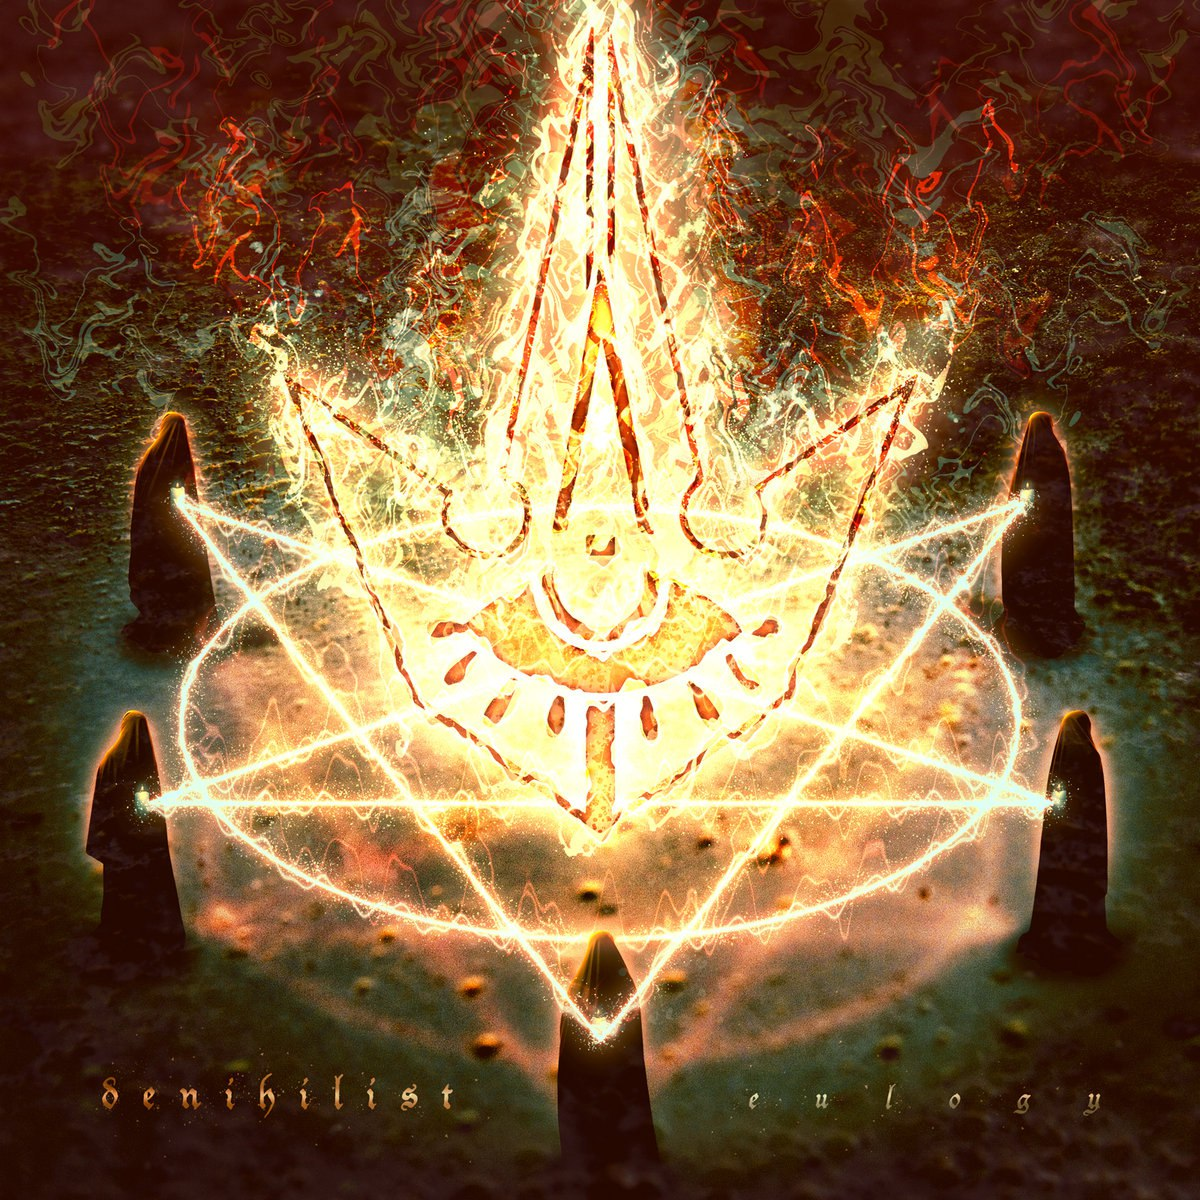 Denihilist - It That Betrays [single] (2015)